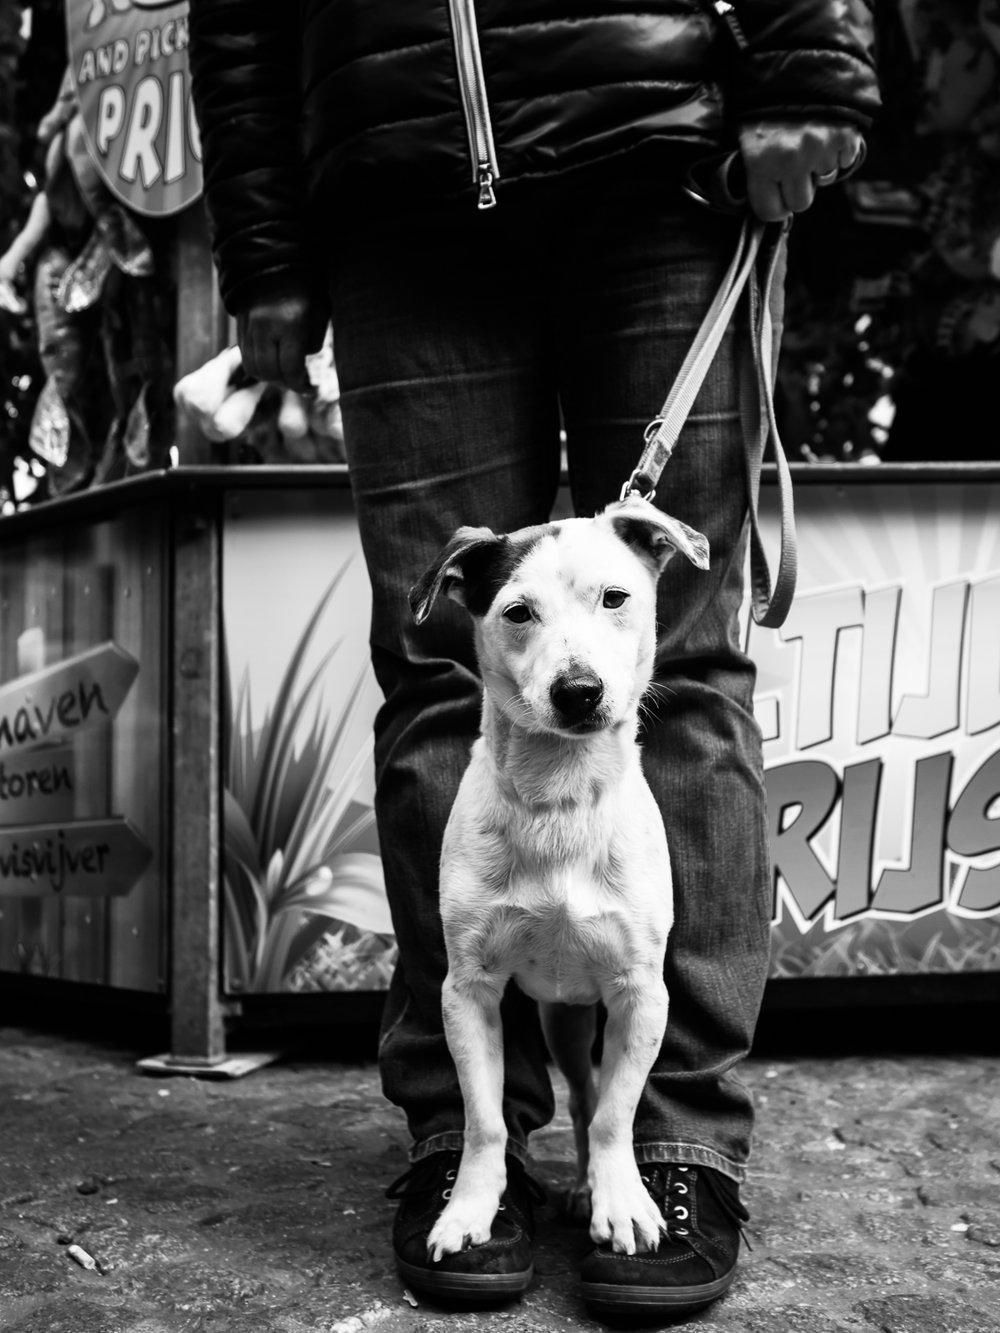 fokko muller street photography - 170415 - 001.jpg